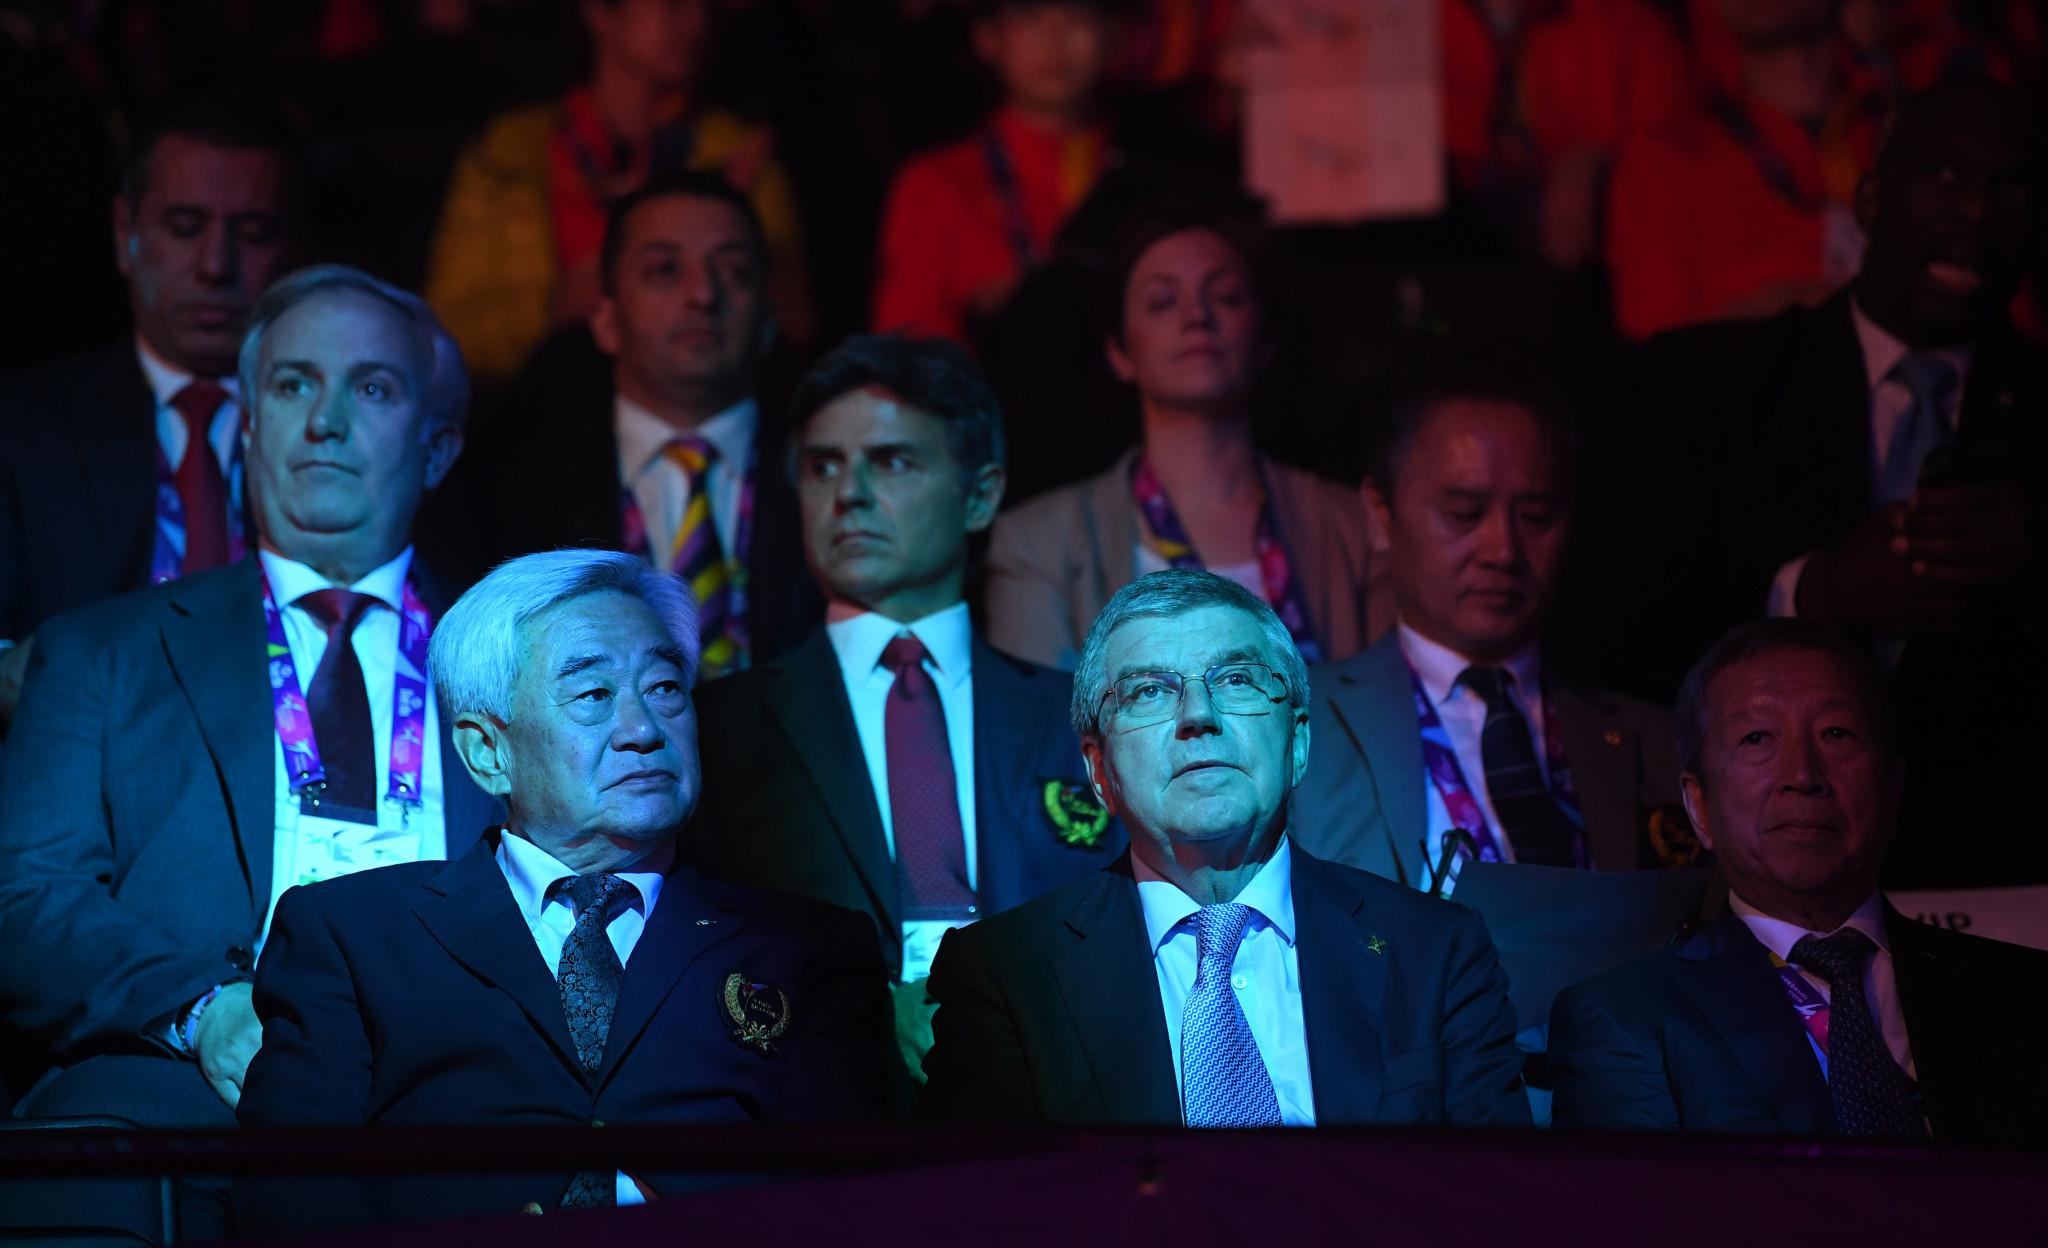 World Taekwondo President Choue Chung-won sits next to International Olympic Committee President Thomas Bach at the recent World Taekwondo Championships at Manchester ©Getty Images